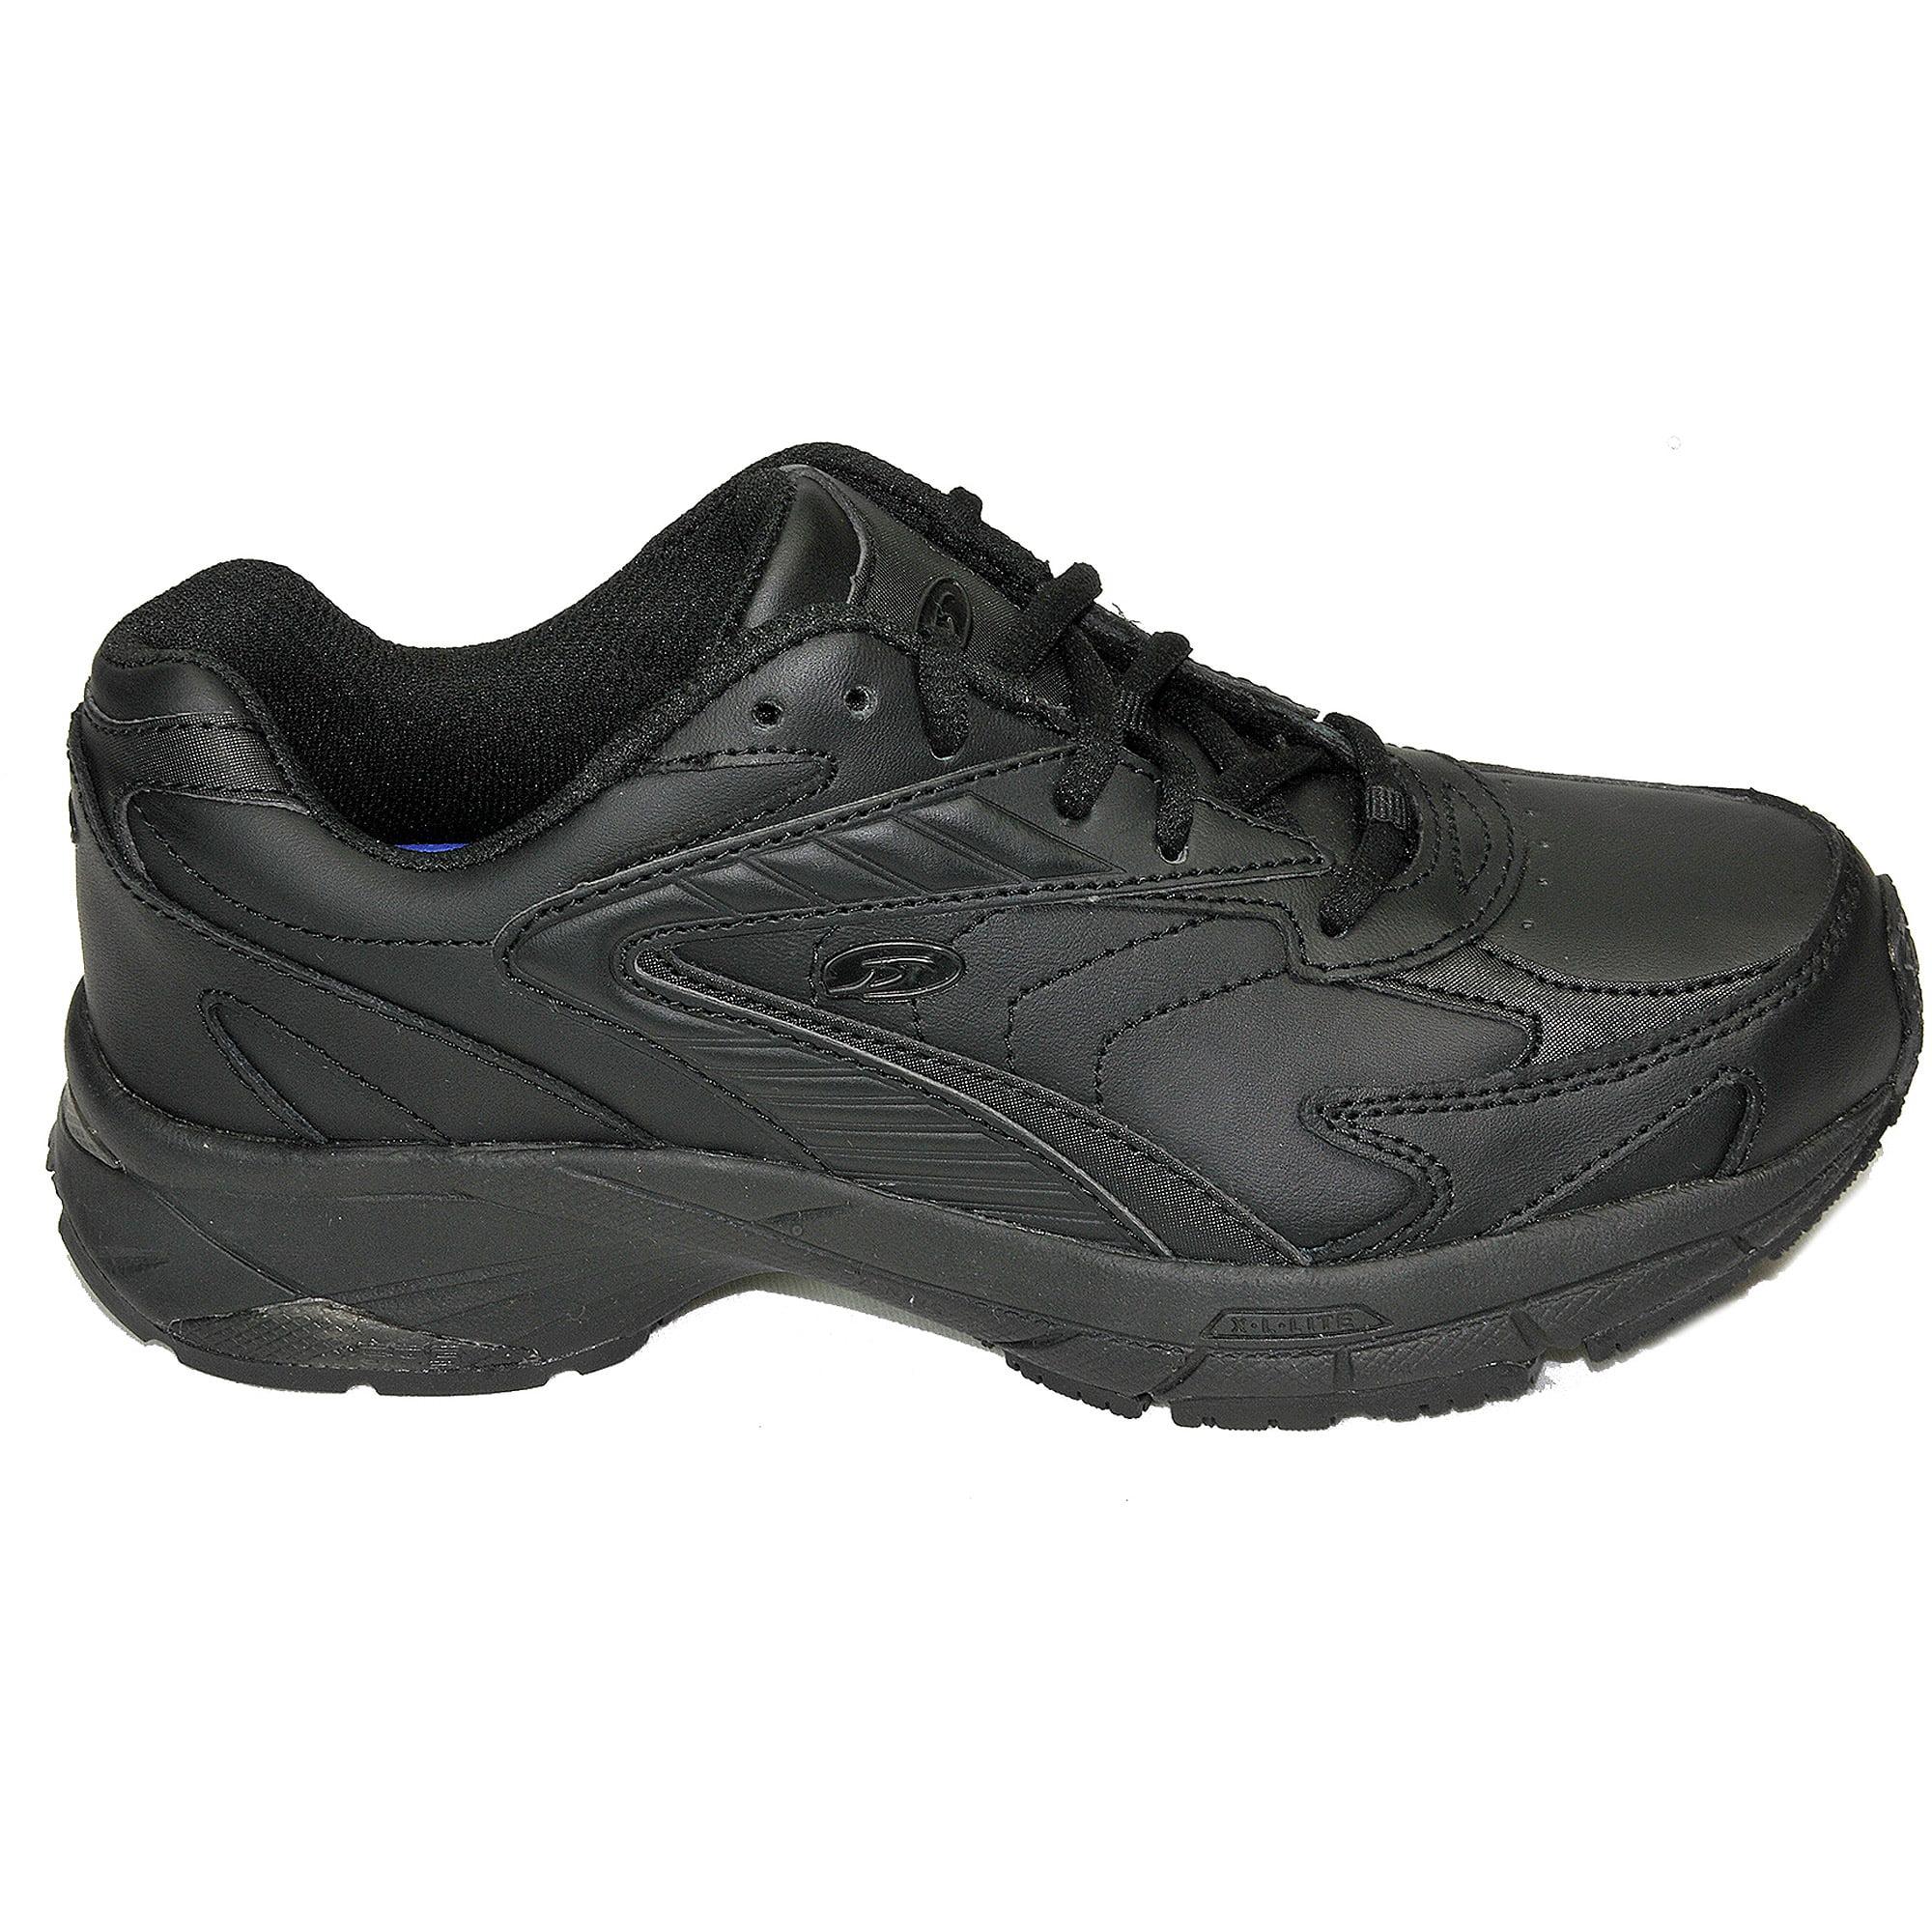 Keuka SureGrip Womens Cater Black Casual Slip Resistant Work Shoes - Walmart.com